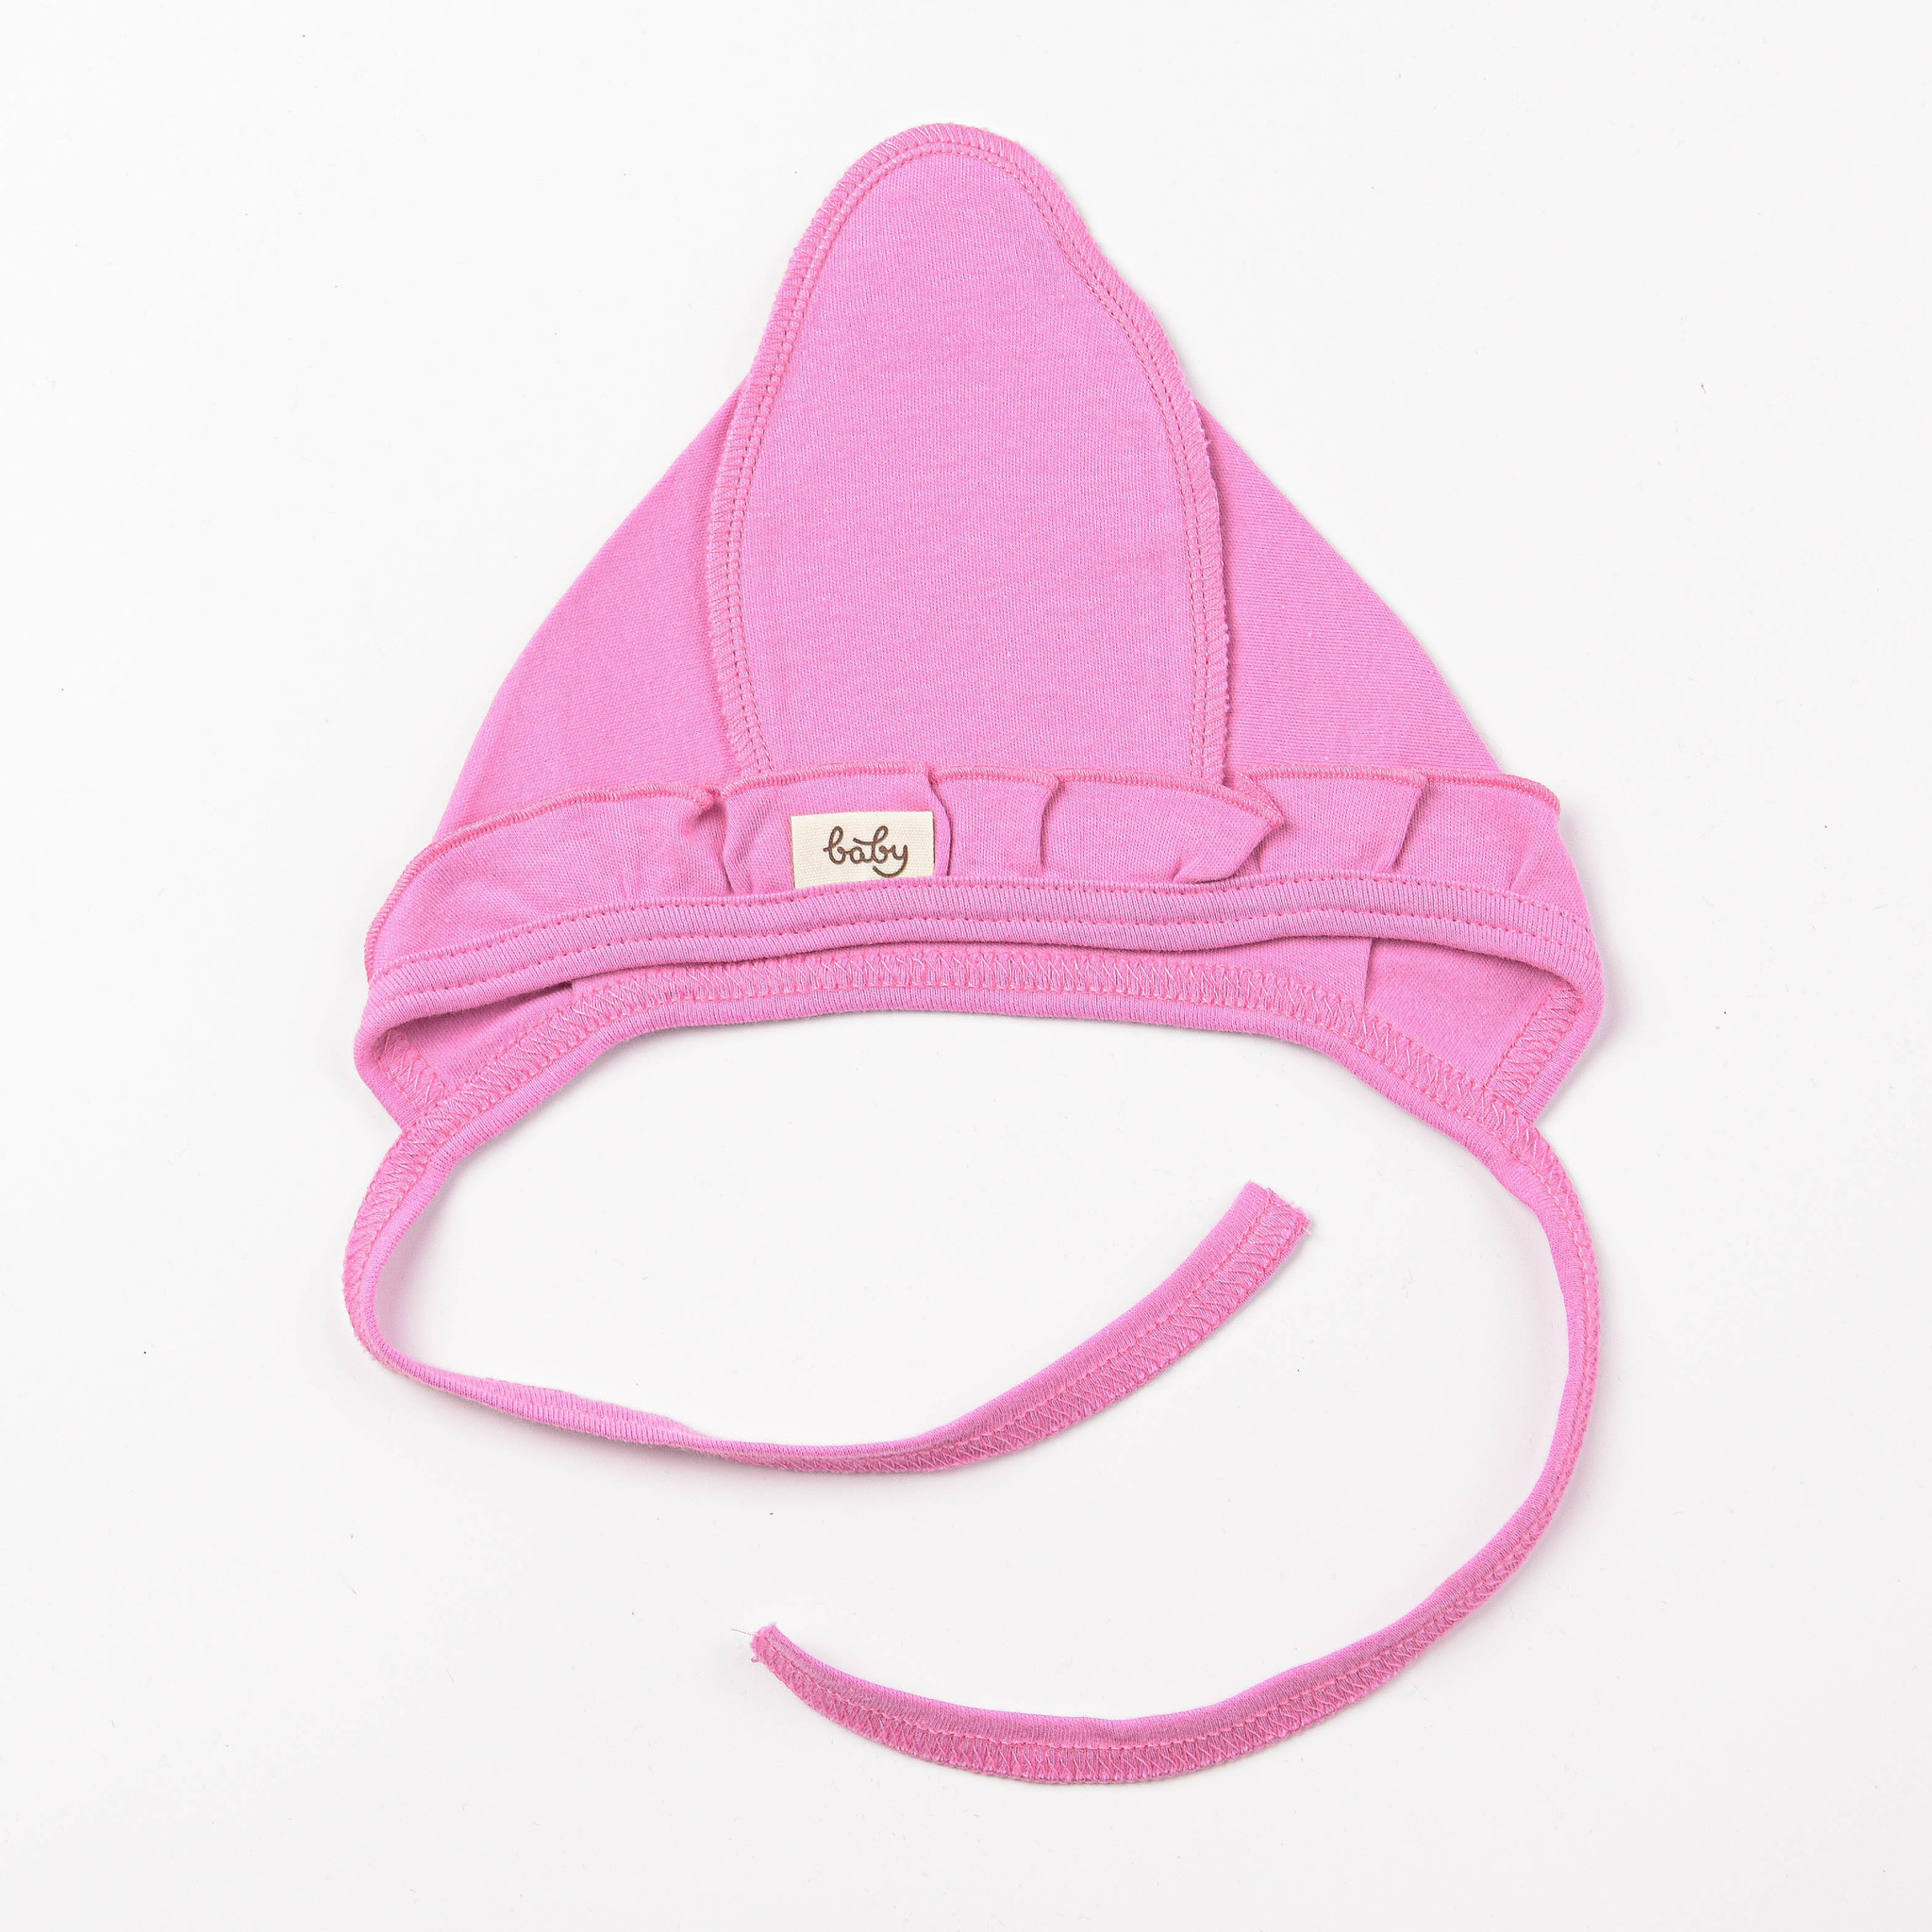 Ruffled baby hat 0+, Peony